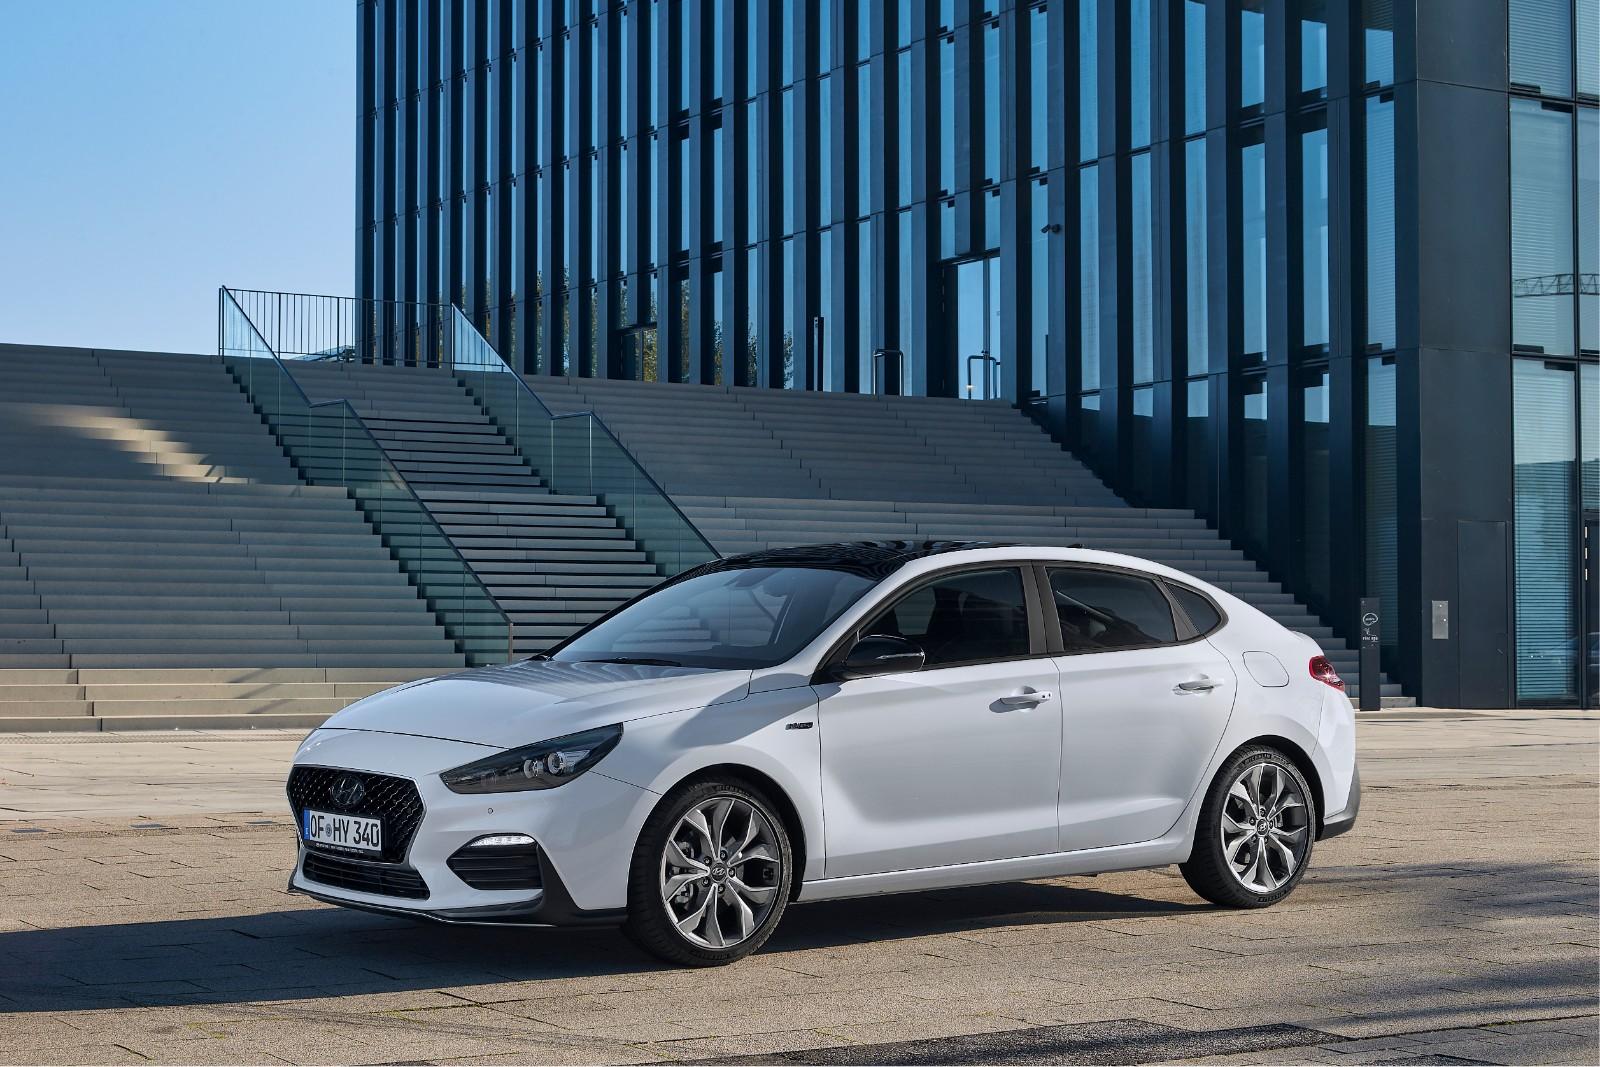 2017 - [Hyundai] i30 Fastback - Page 3 769374l